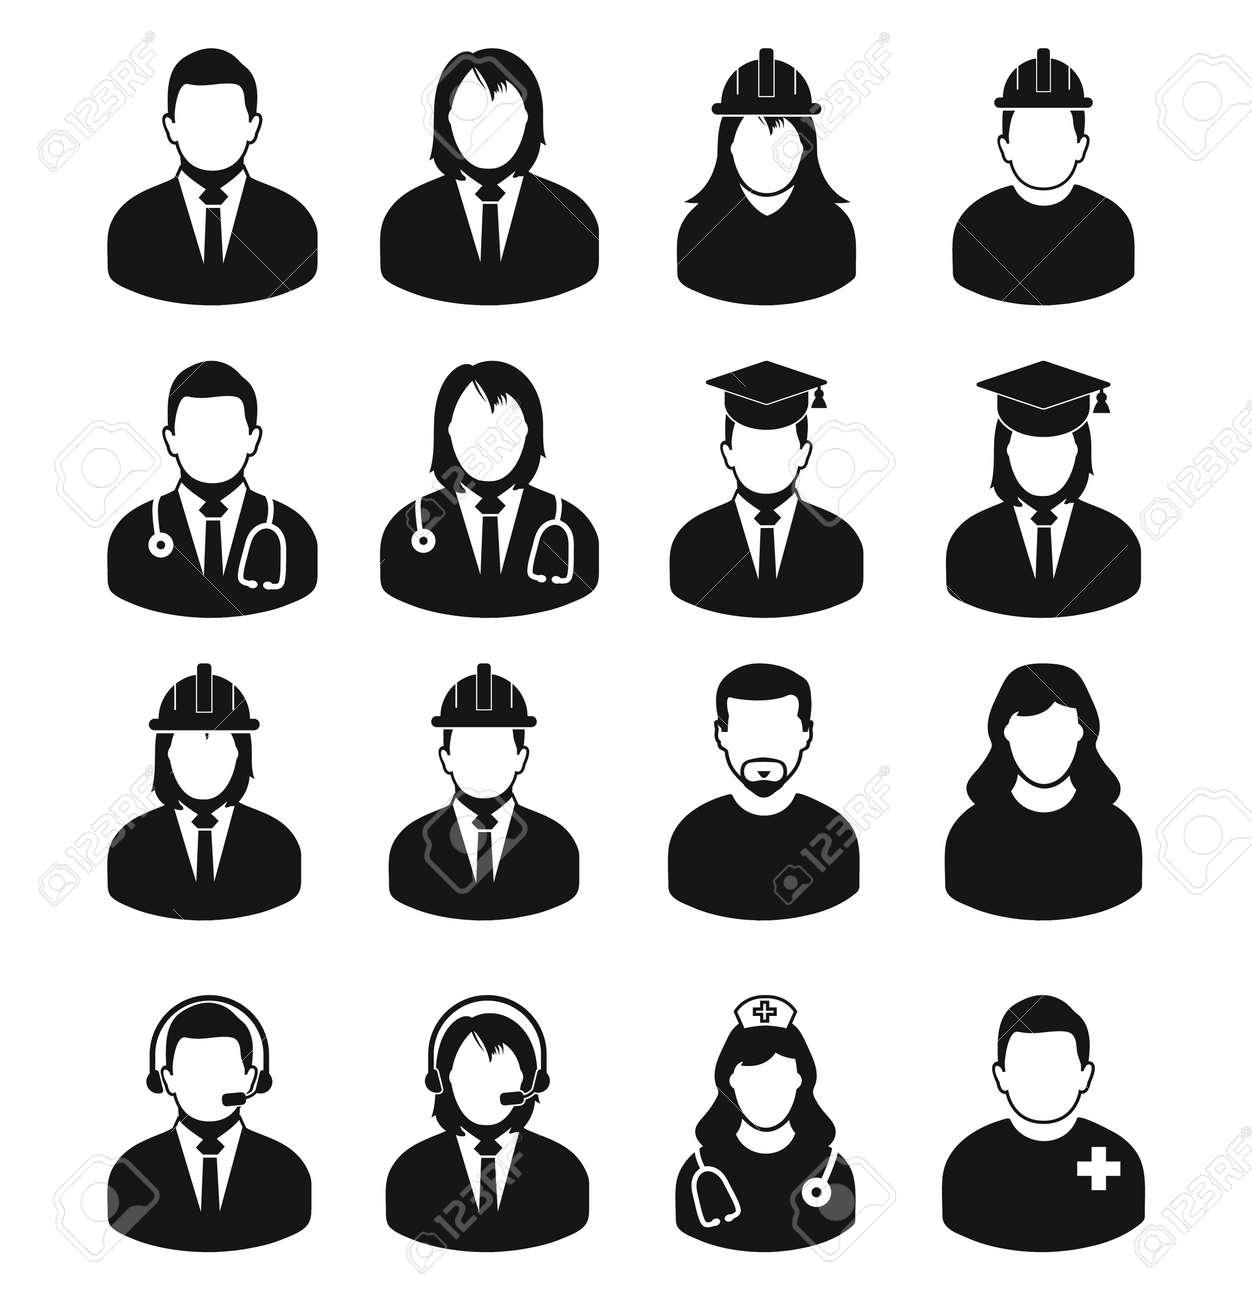 People profile icon set of different profession. Corporate man, Graduate Student, Customer Service, Doctor, Nurse, Engineer etc. - 129487910